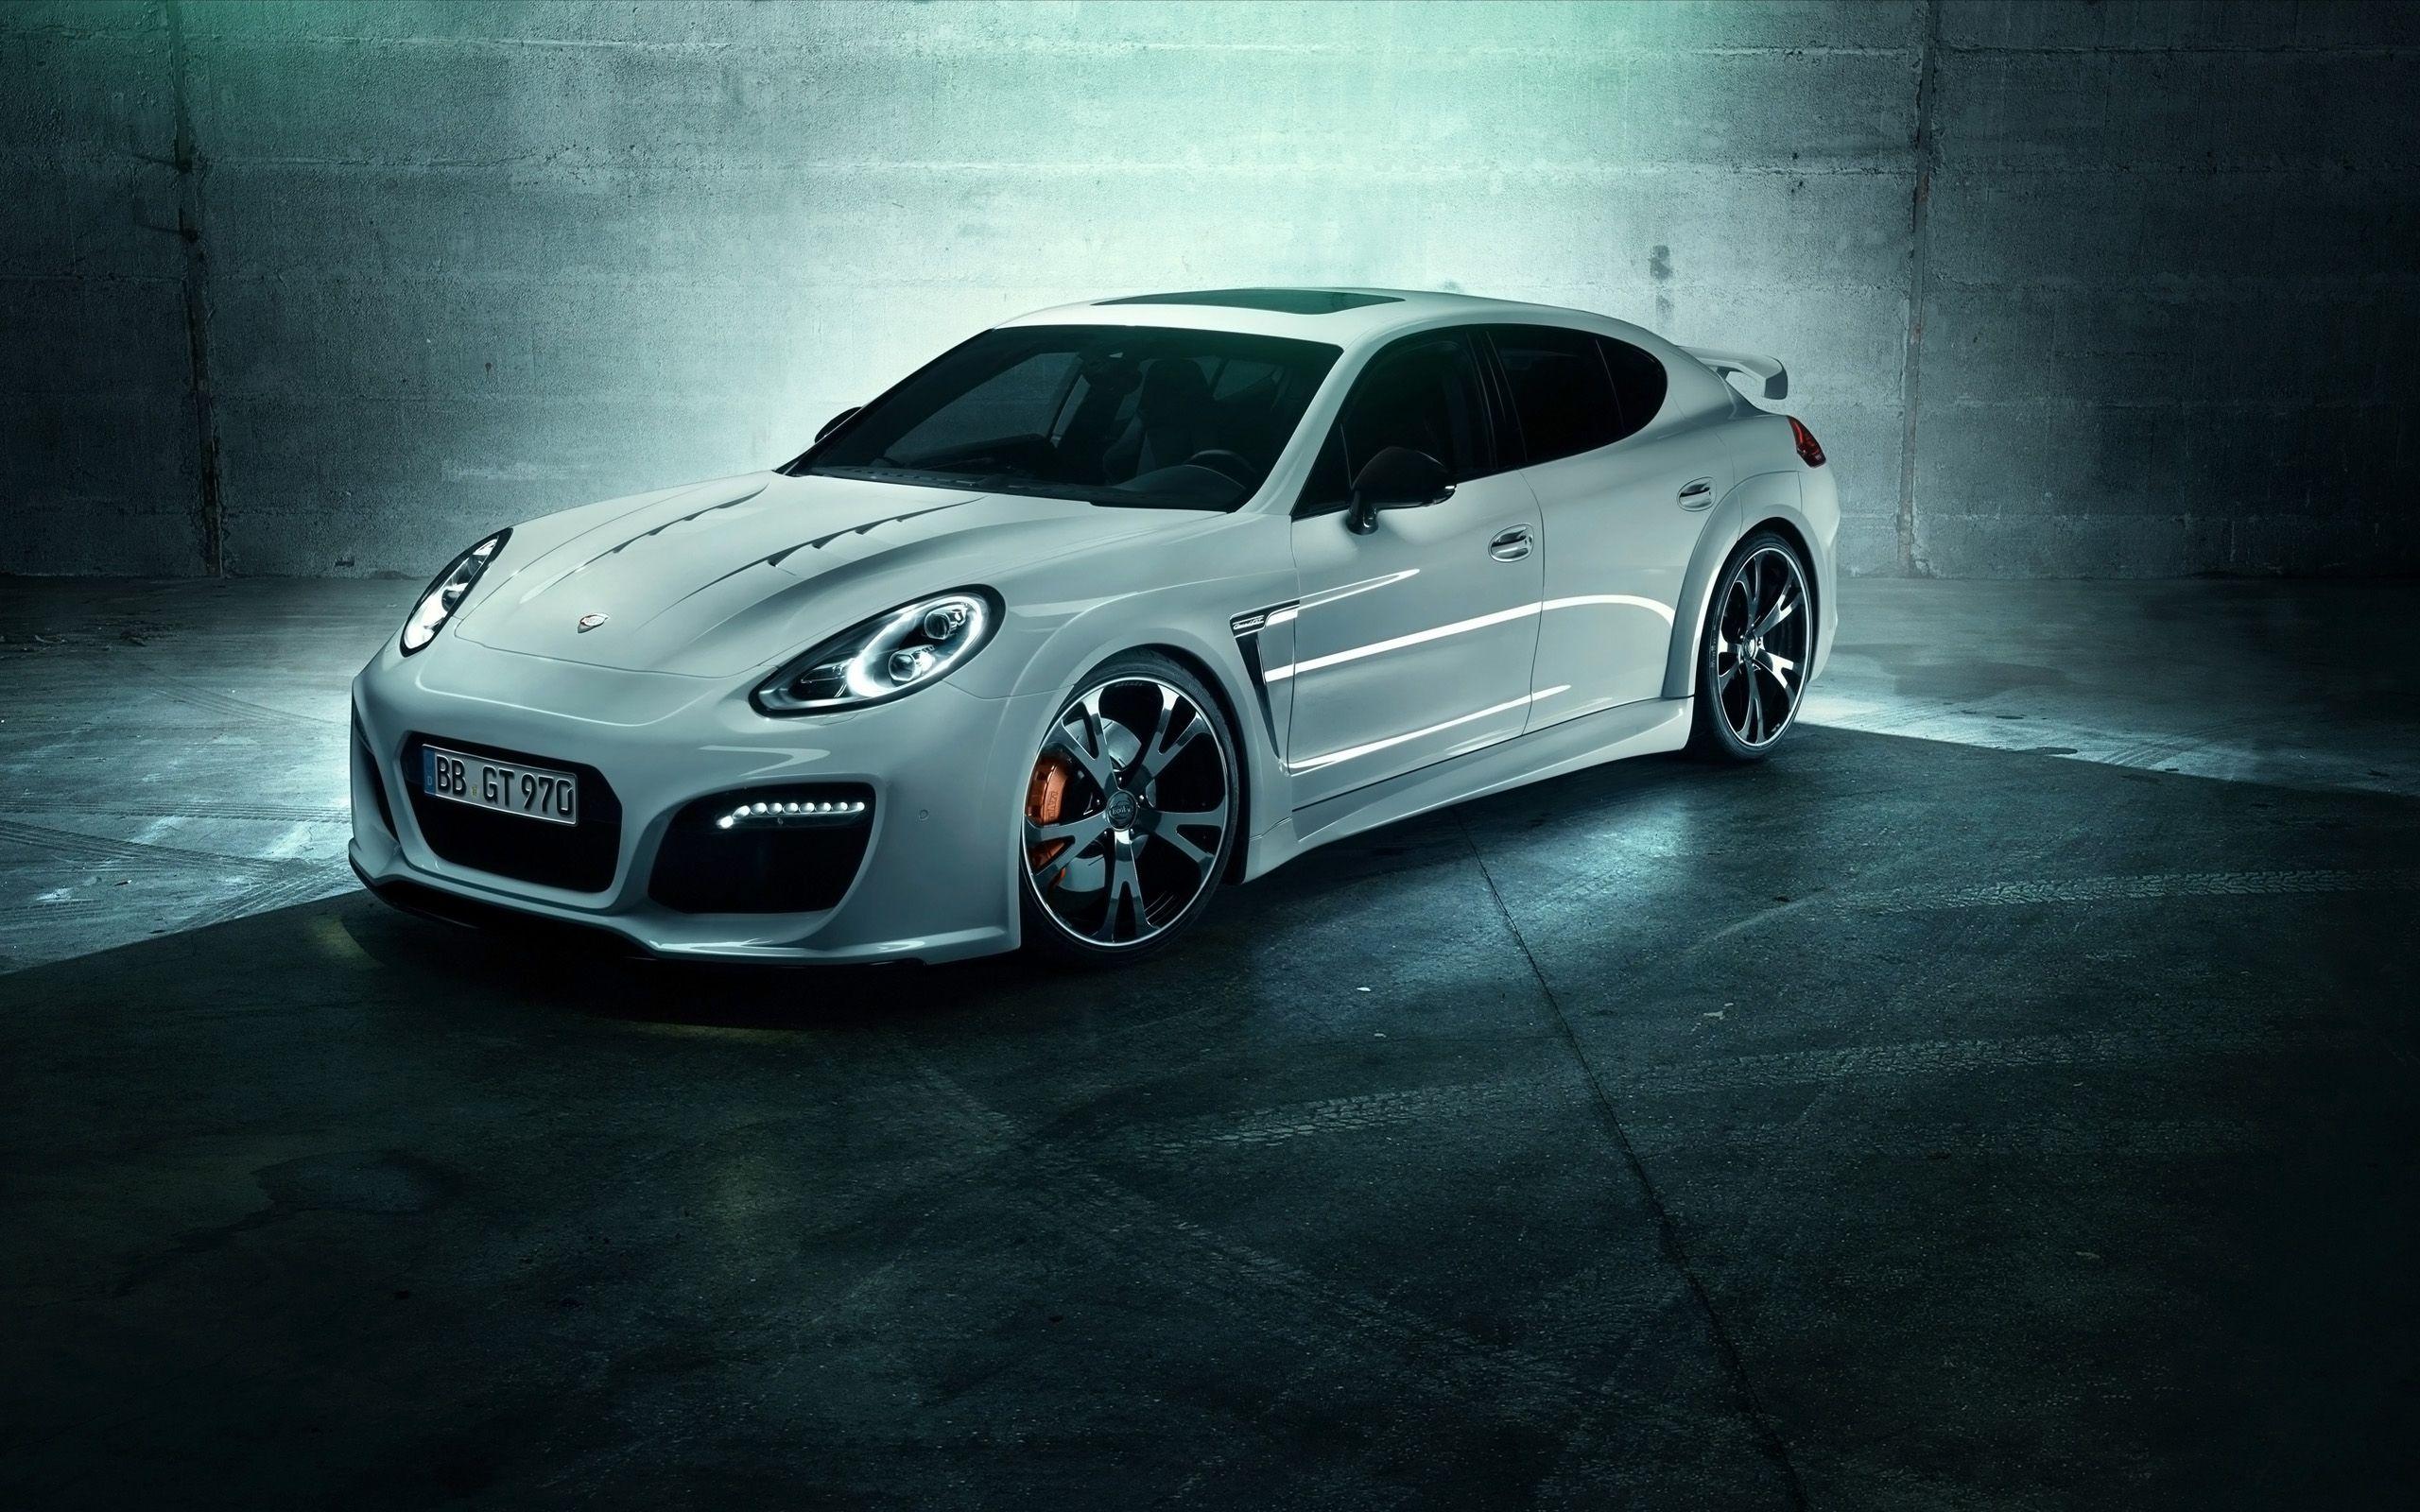 techart porsche panamera cool wallpapers download - Porsche Wallpapers For Desktop